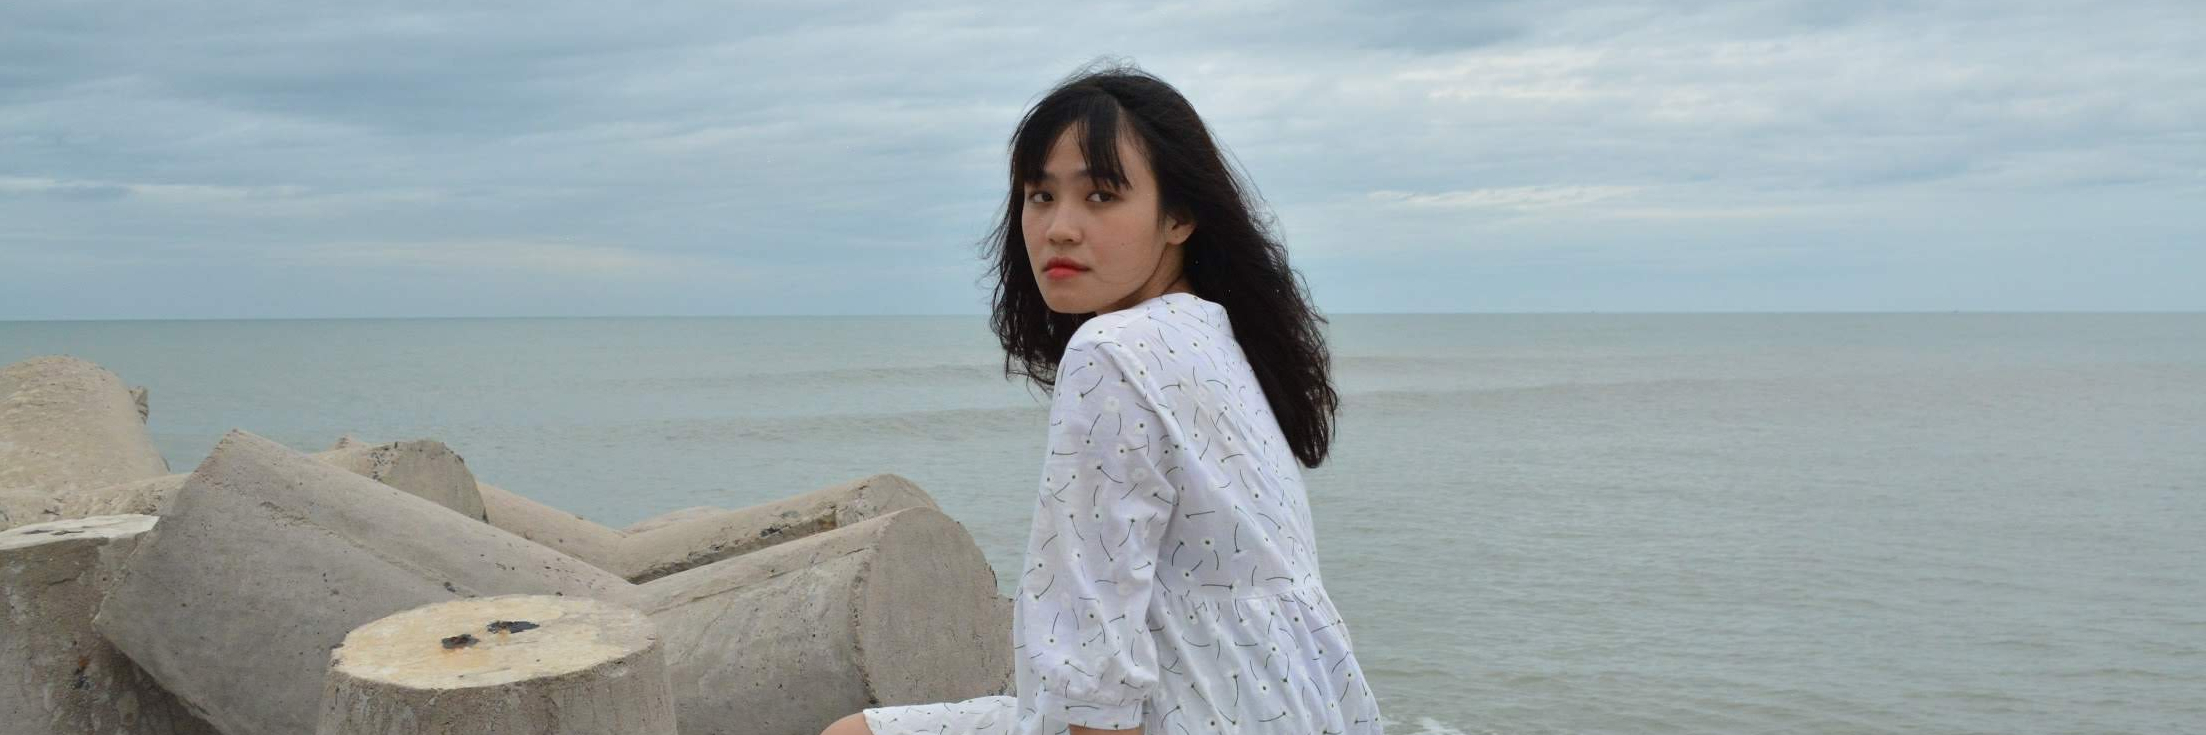 https://gody.vn/blog/kieudiem01633302/post/check-in-ben-cang-binh-chau-7705